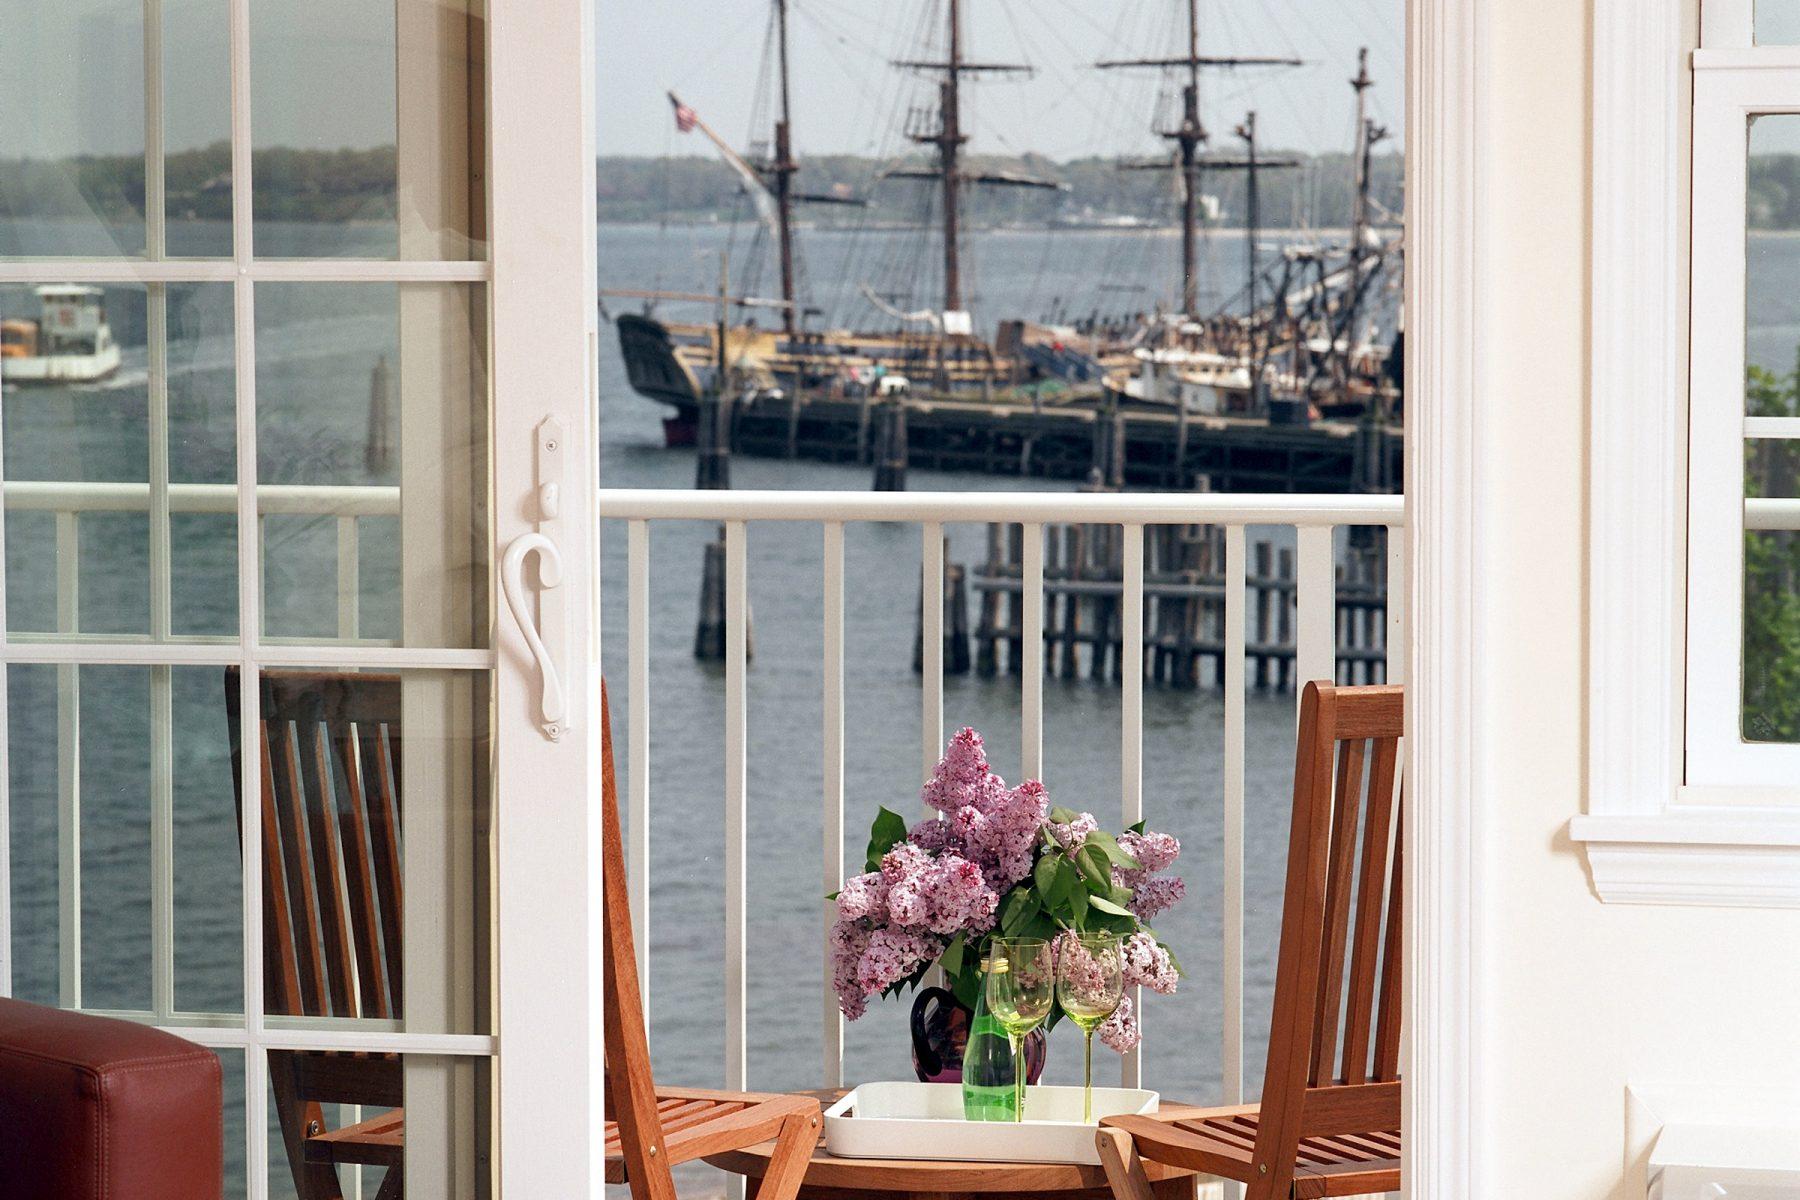 Balcony view overlooking Peconic Bay